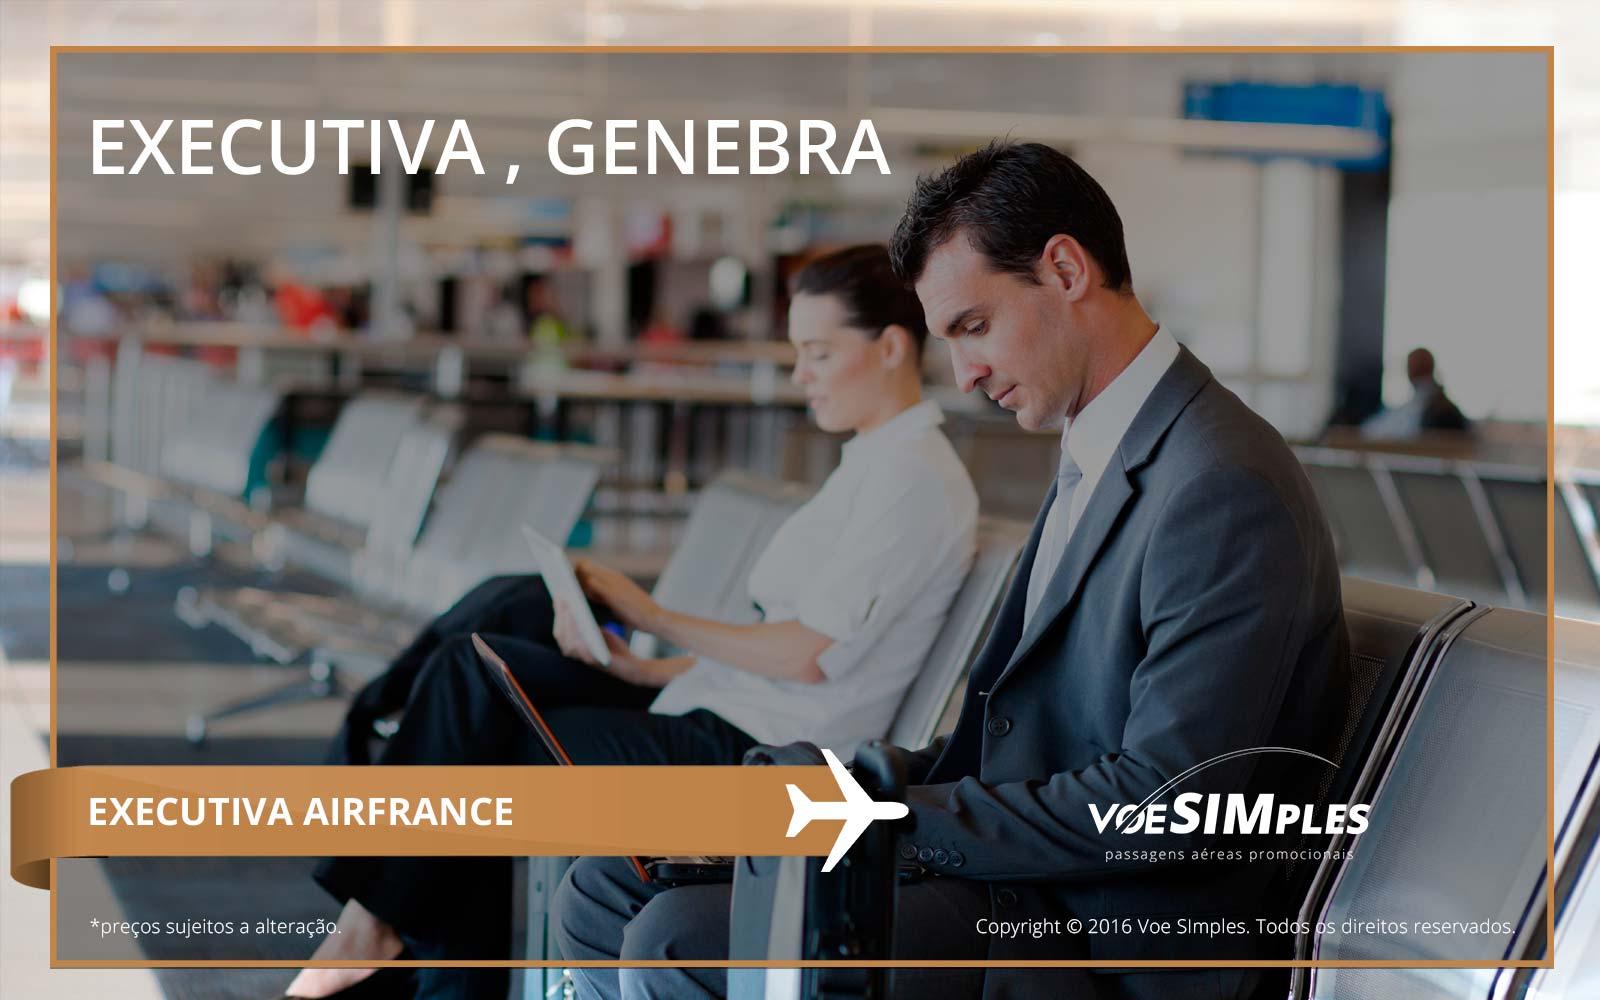 Passagem aérea Classe Executiva Air France para Genebra